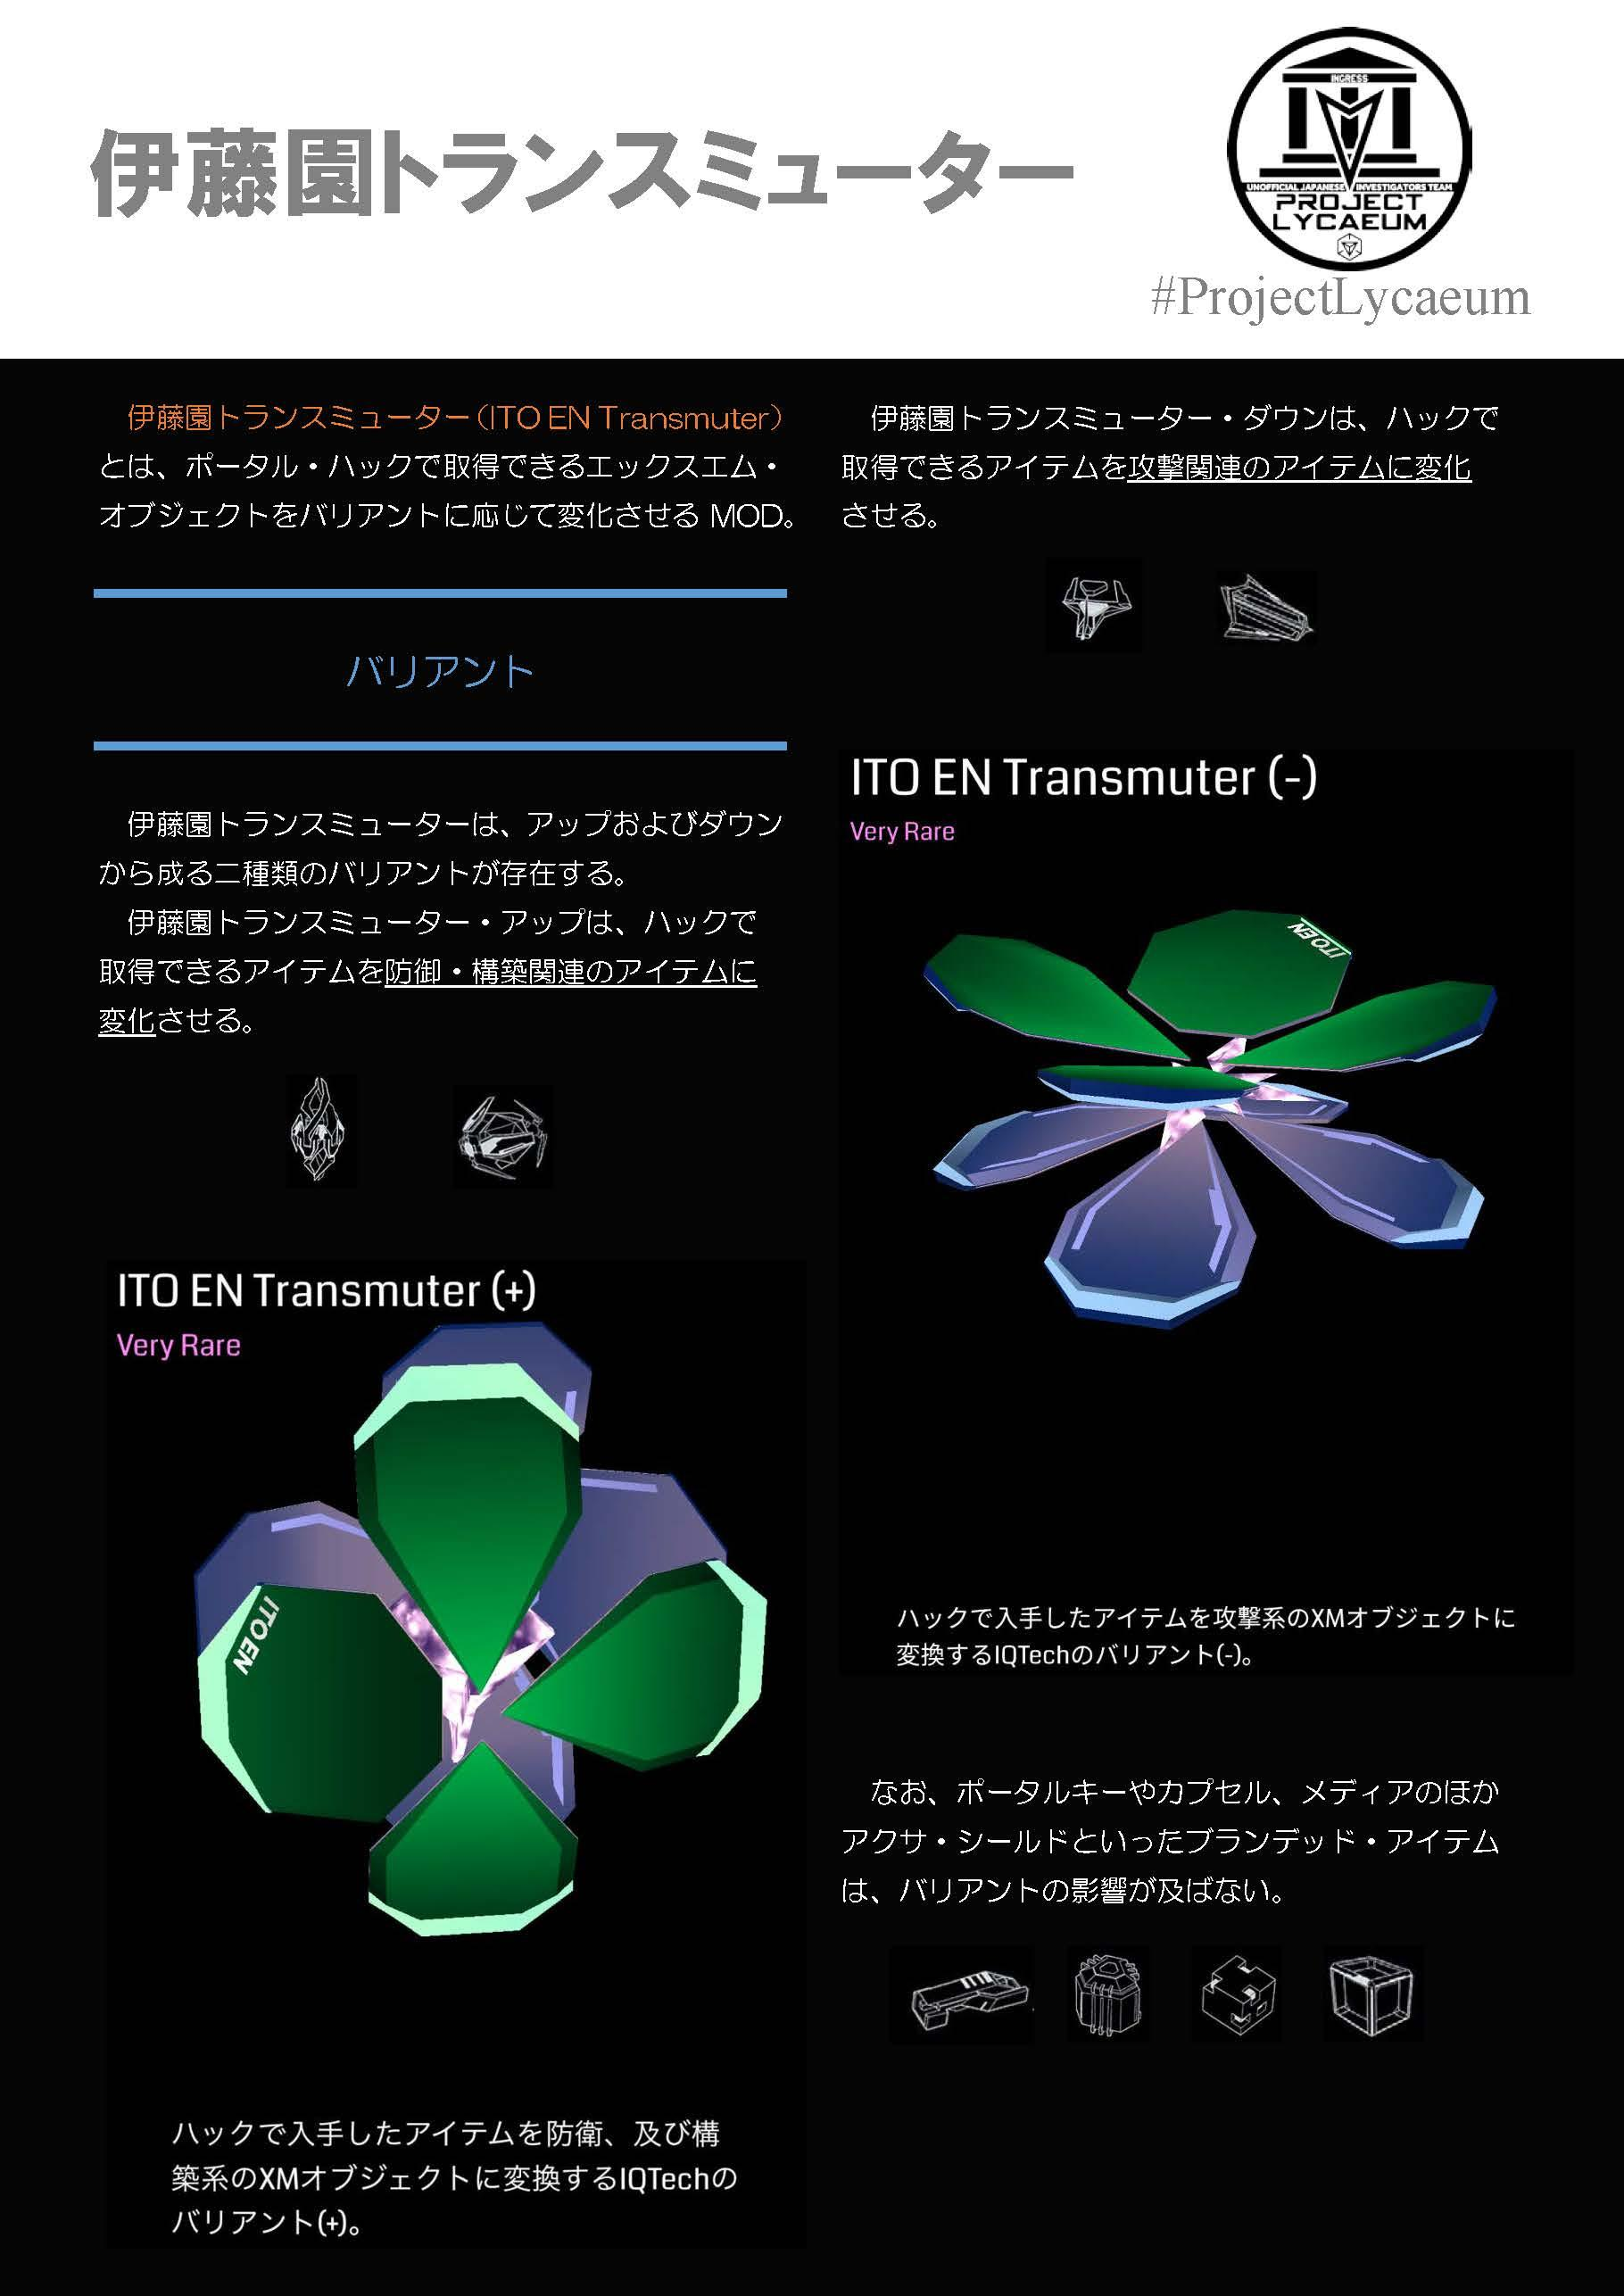 http://ingress.lycaeum.net/2017/07/6e7d2f9bbf9d6c22f16aaceebb2ec6be60fa972a.jpg